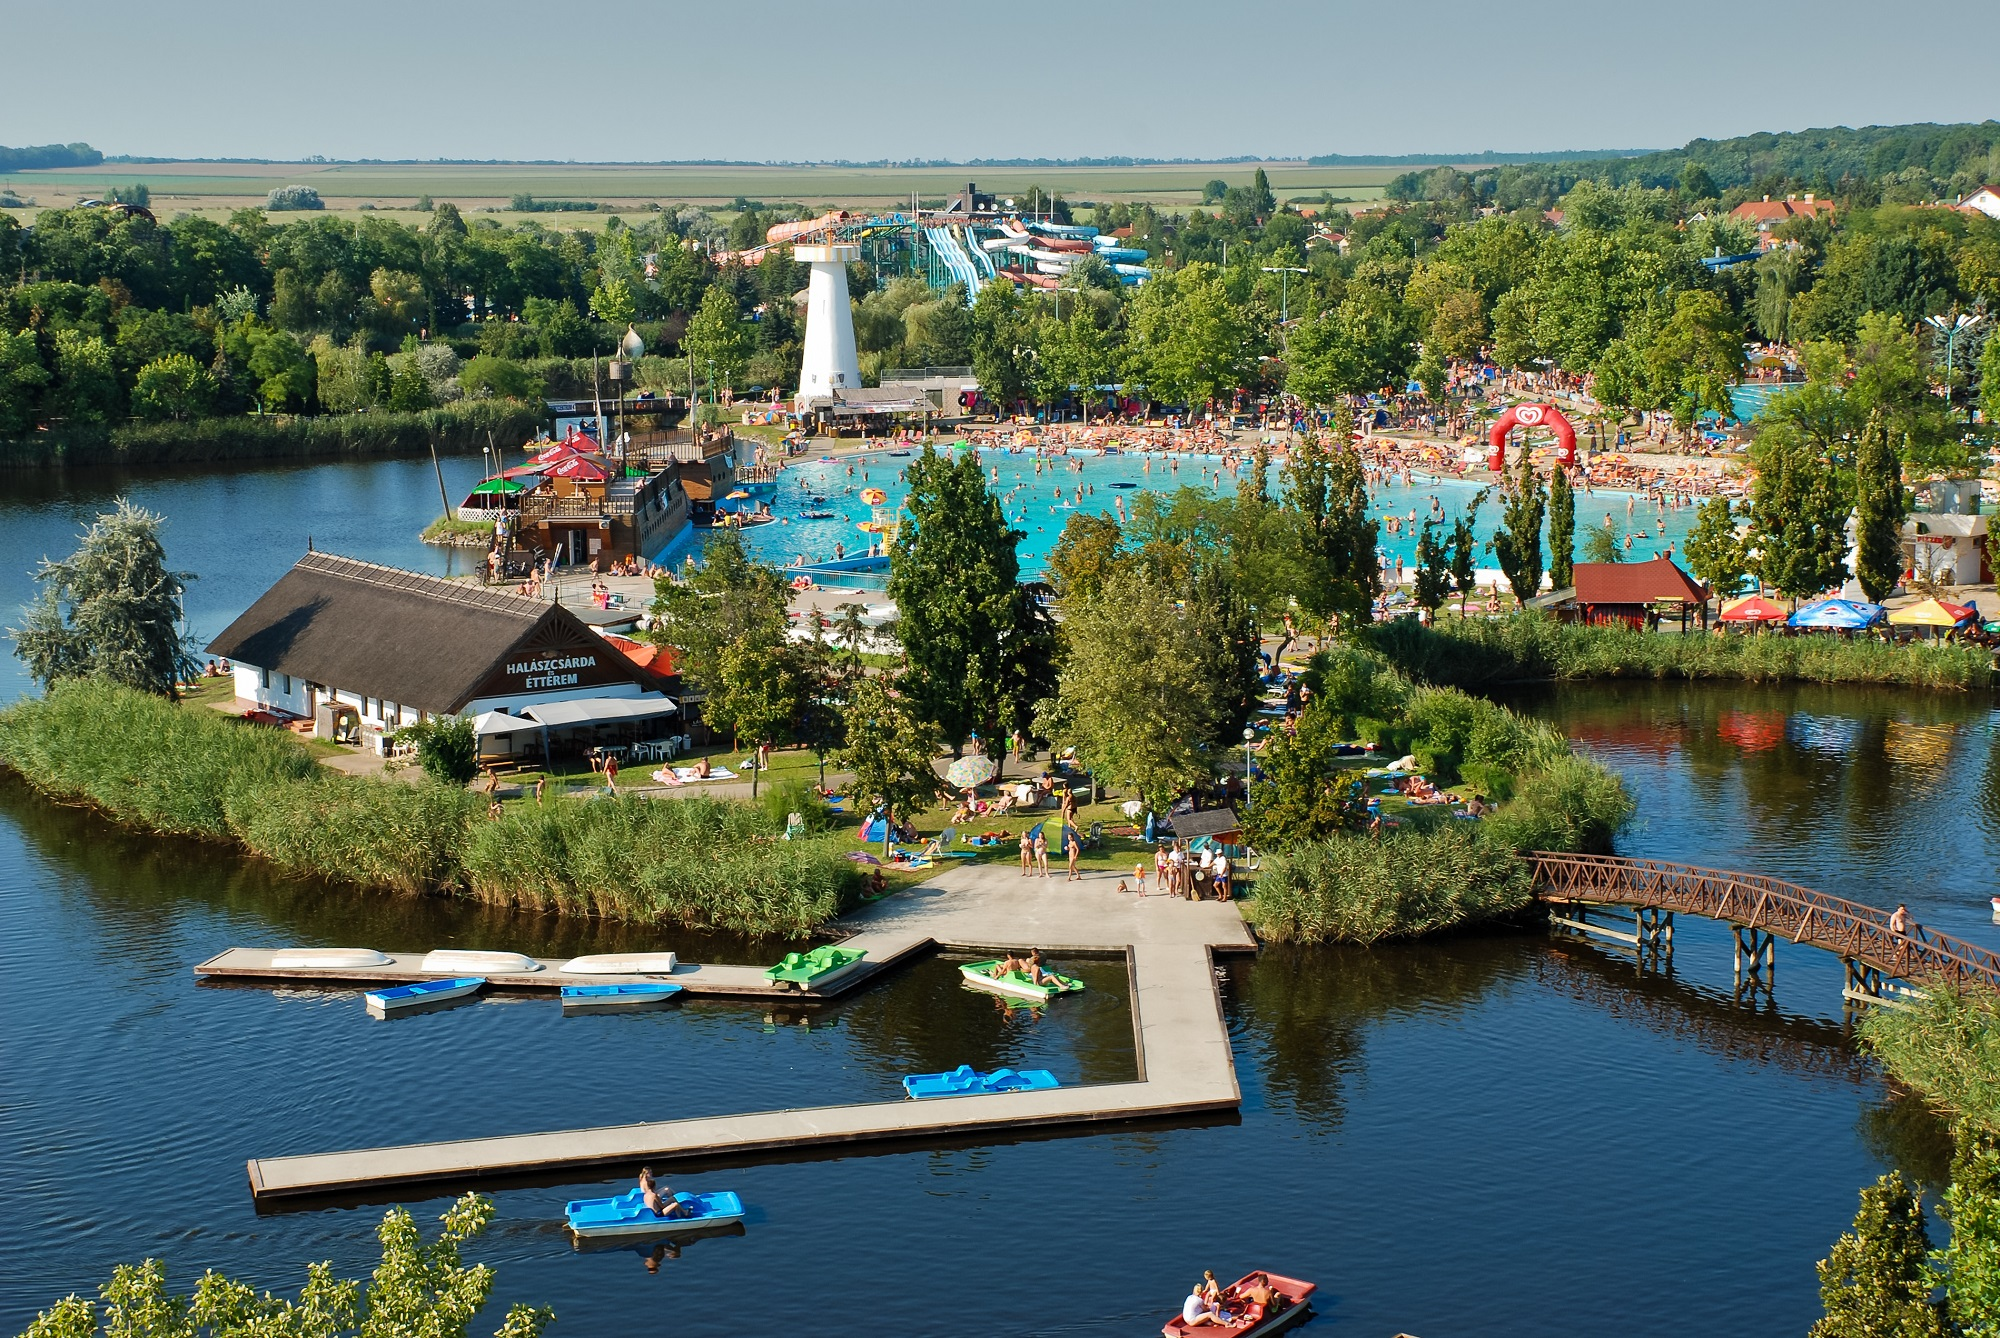 hajduszoboszlo-furdokomplexum-strand-aquapark-csonakazo-to2000.jpg